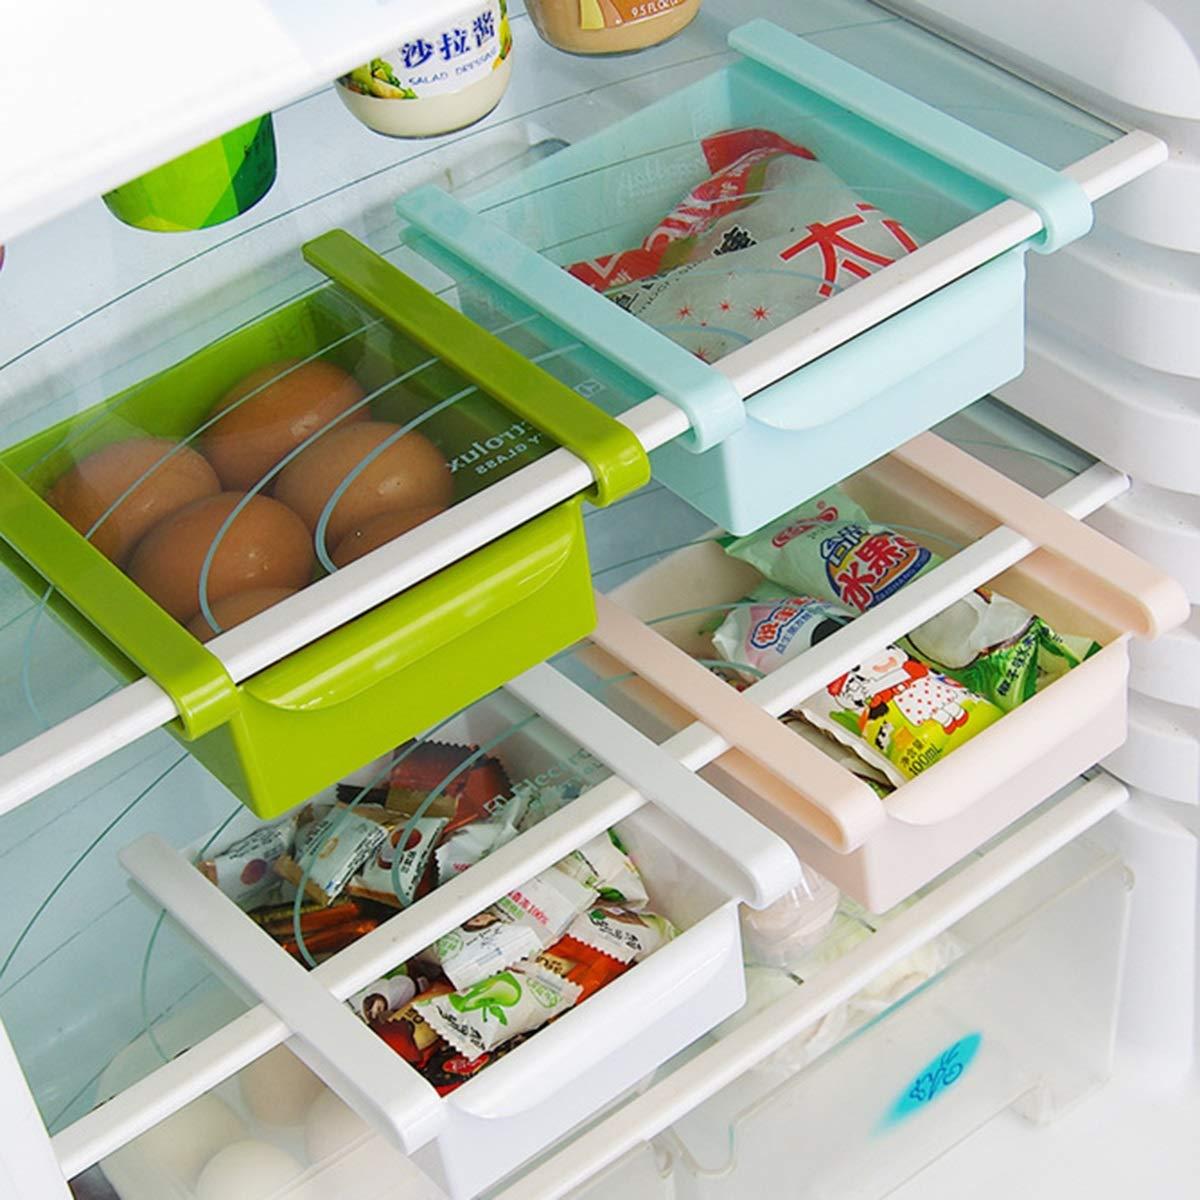 Multifunction Refrigerator Drawer Fridge Storage Box Rack Shelf Holder Slide Fridge Organizer Kitchen Accessory (Color : Blue, Size : 15.5cm x 16.5cm x 7cm)